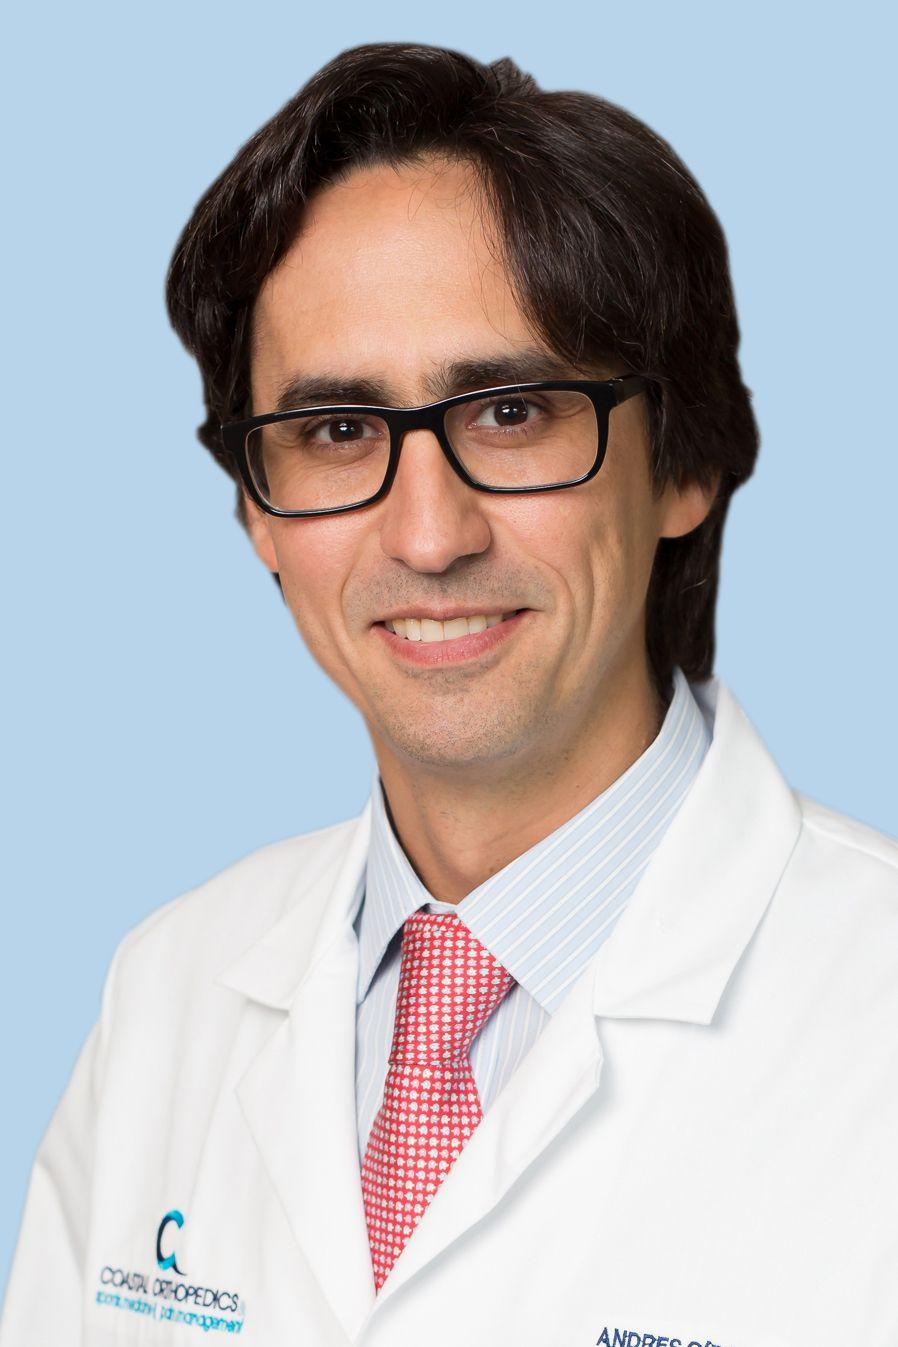 Andrés E. O'Daly, M.D. (With images) Orthopedics, Sports